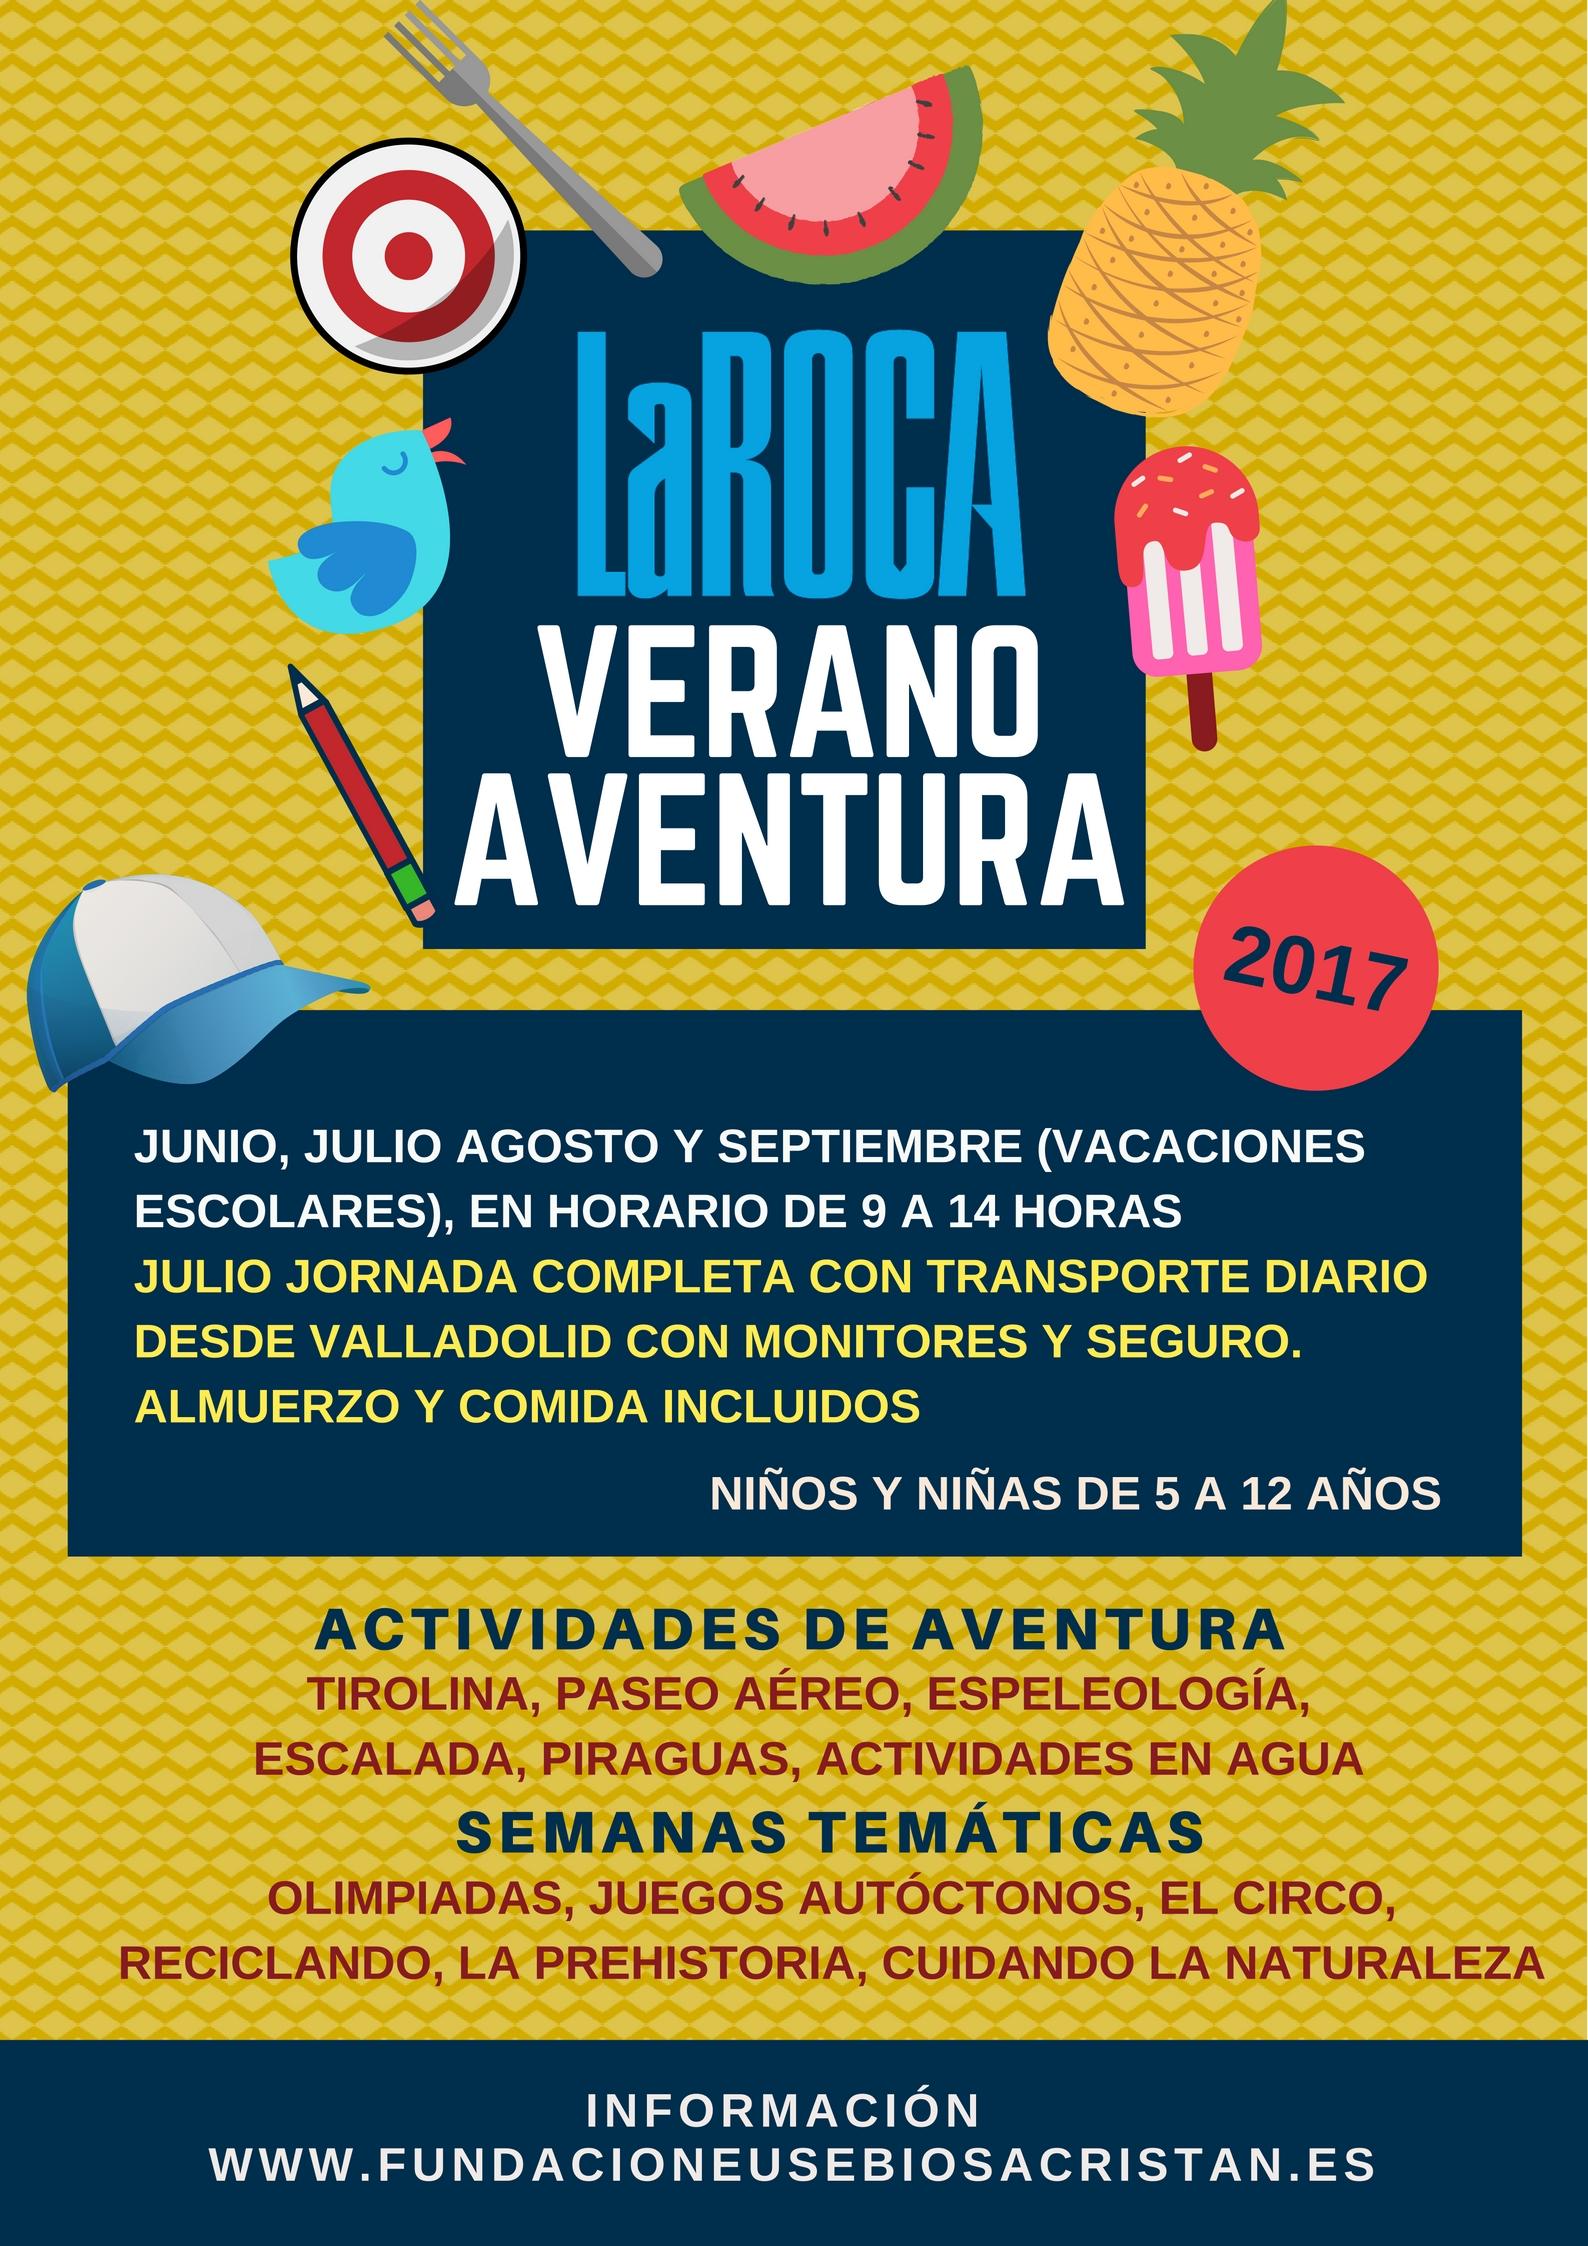 VERANO AVENTURA GENERAL